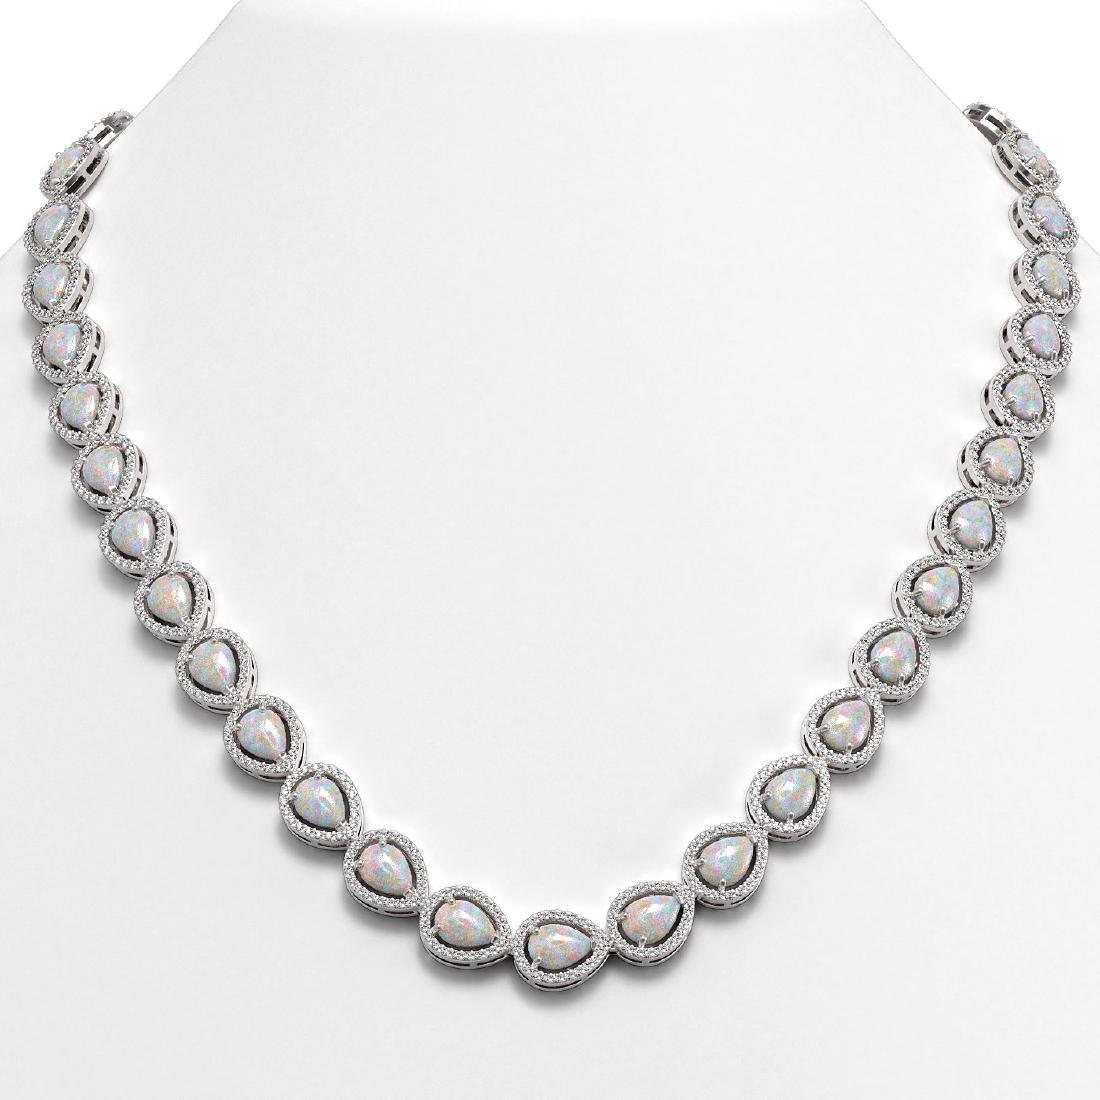 27.93 CTW Opal & Diamond Halo Necklace 10K White Gold